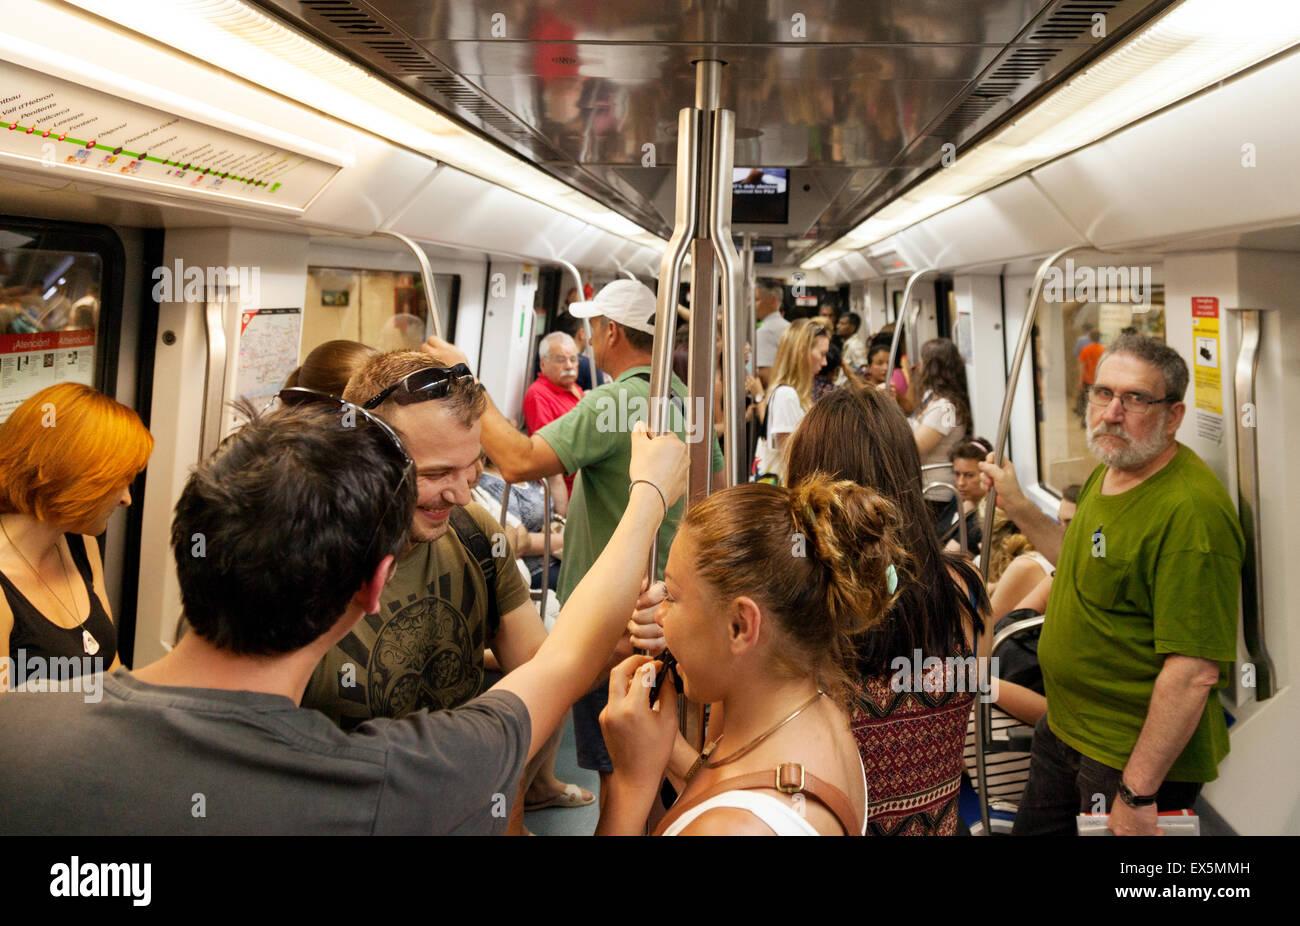 Local spanish people in a metro train carriage barcelona metro stock photo royalty free image - Carrage metro ...